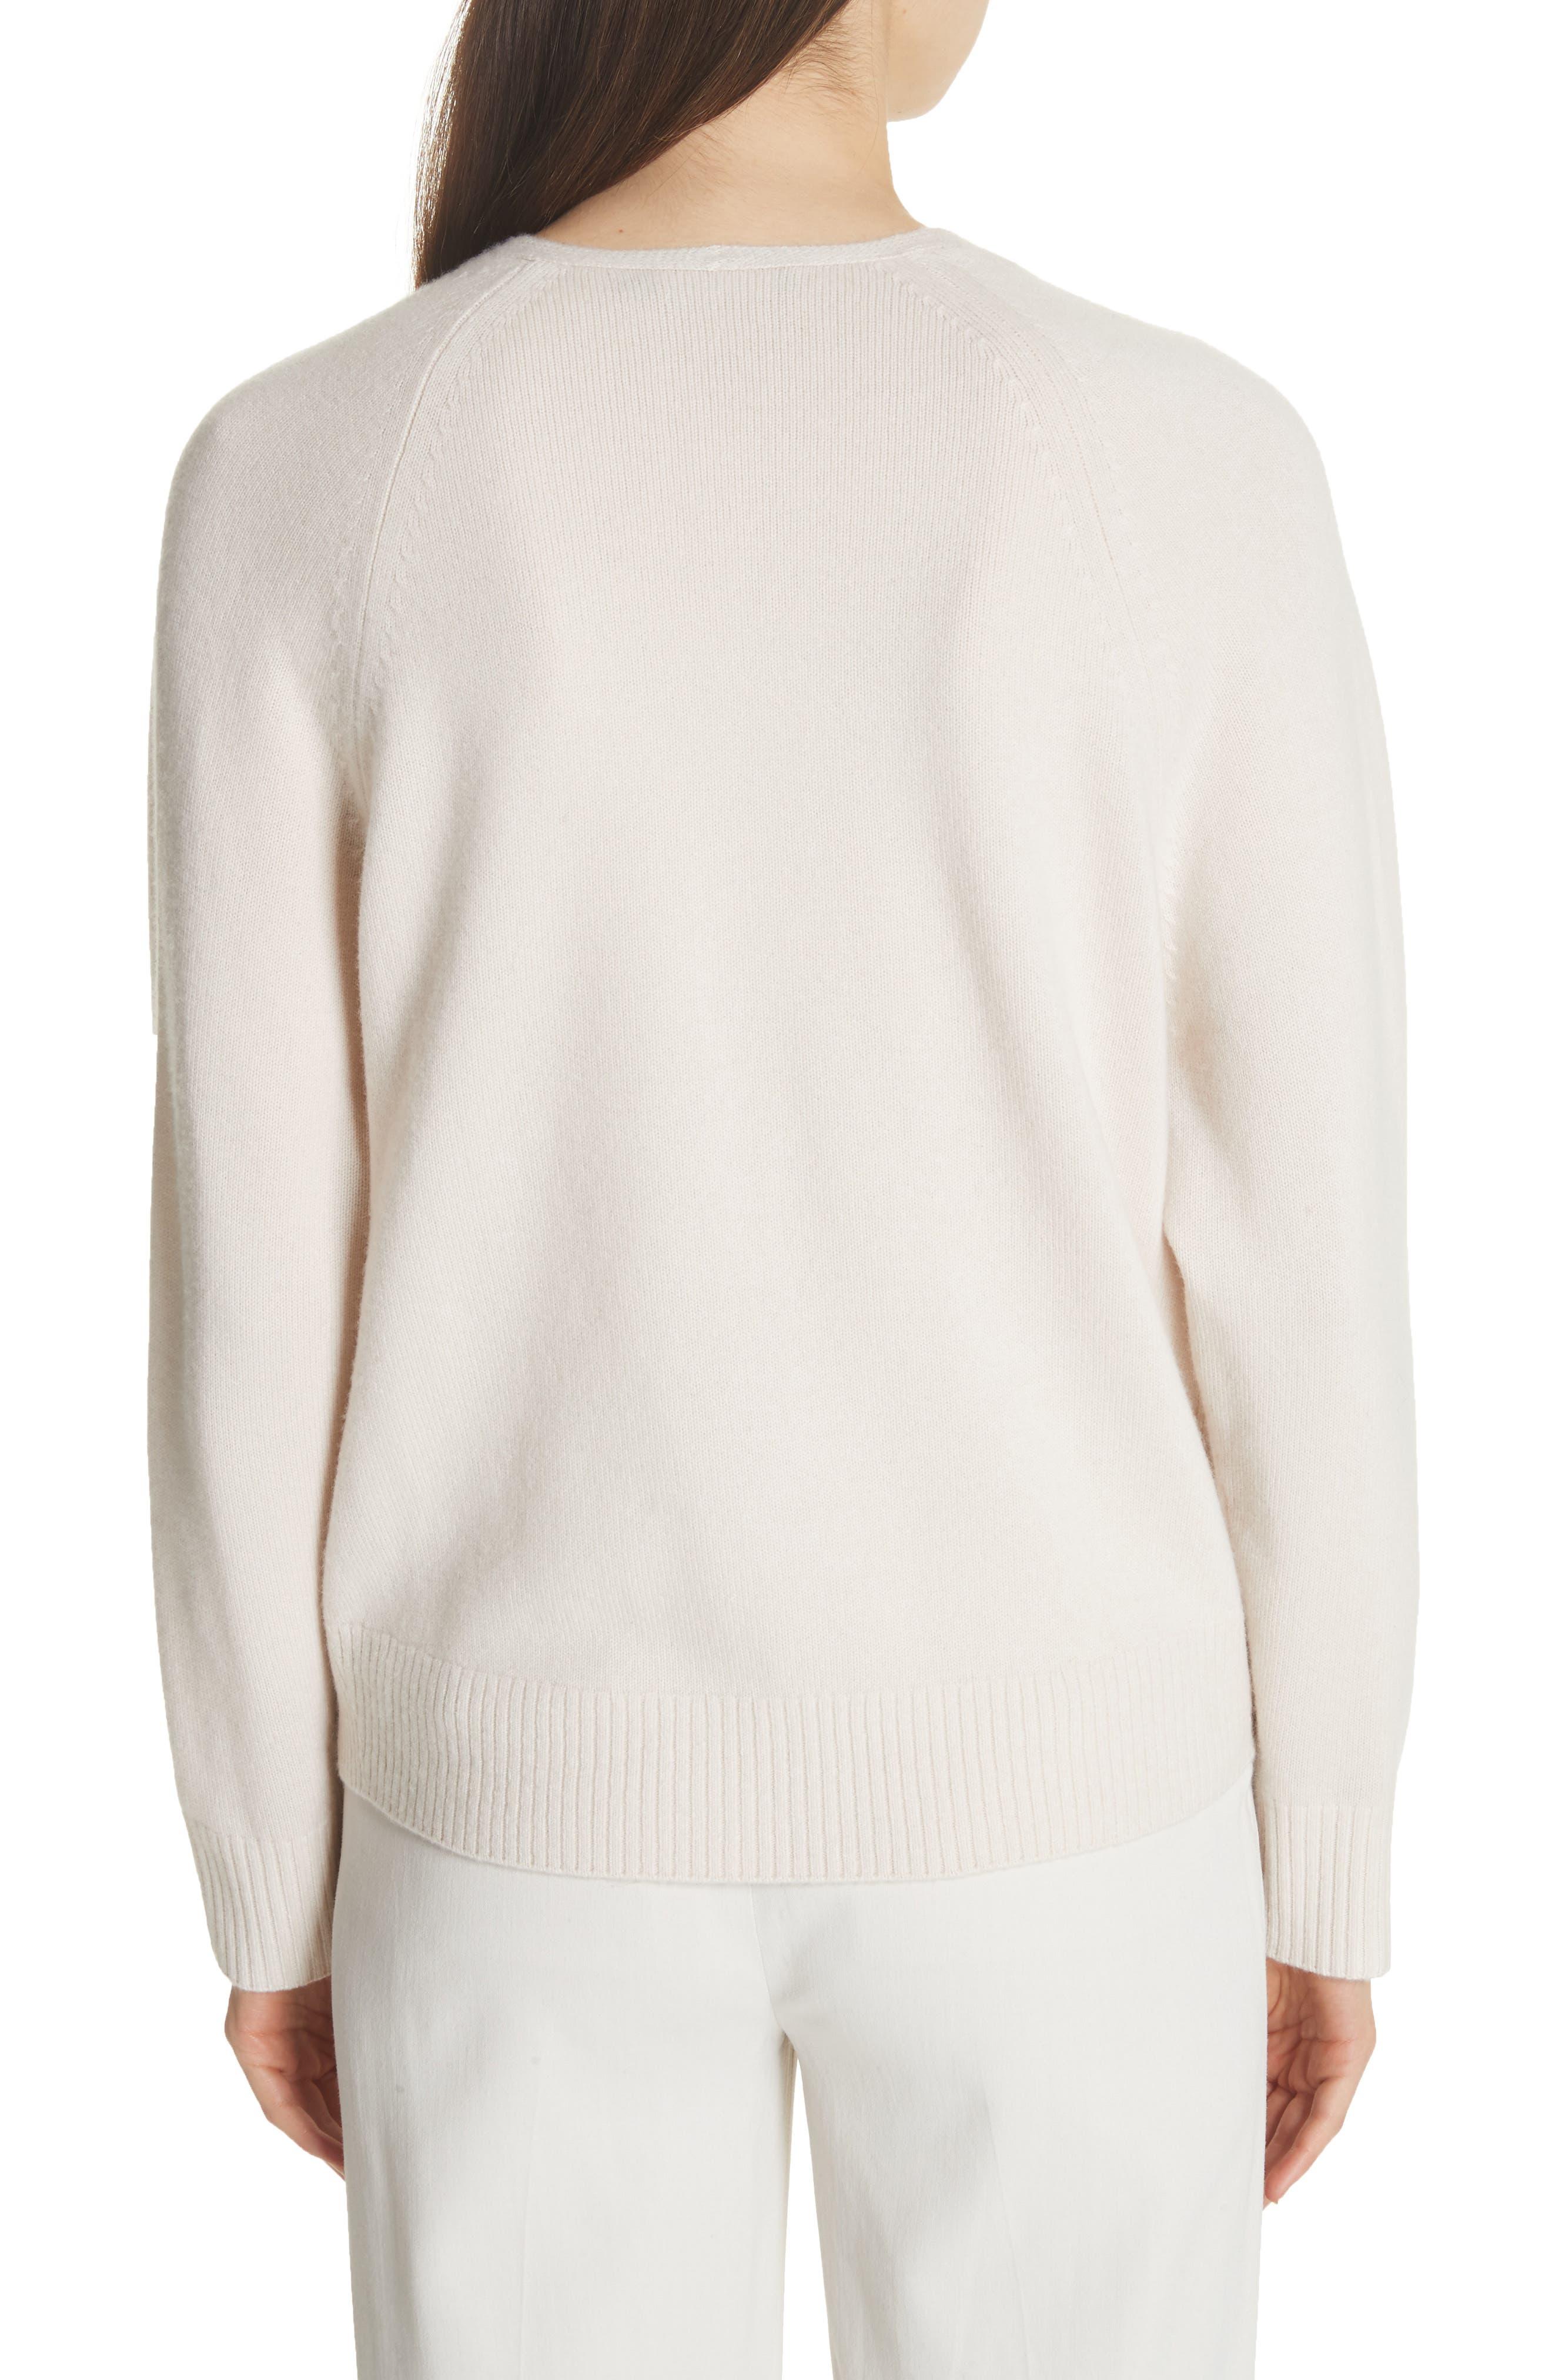 Cashmere Raglan Sleeve Sweater,                             Alternate thumbnail 2, color,                             Sandstone